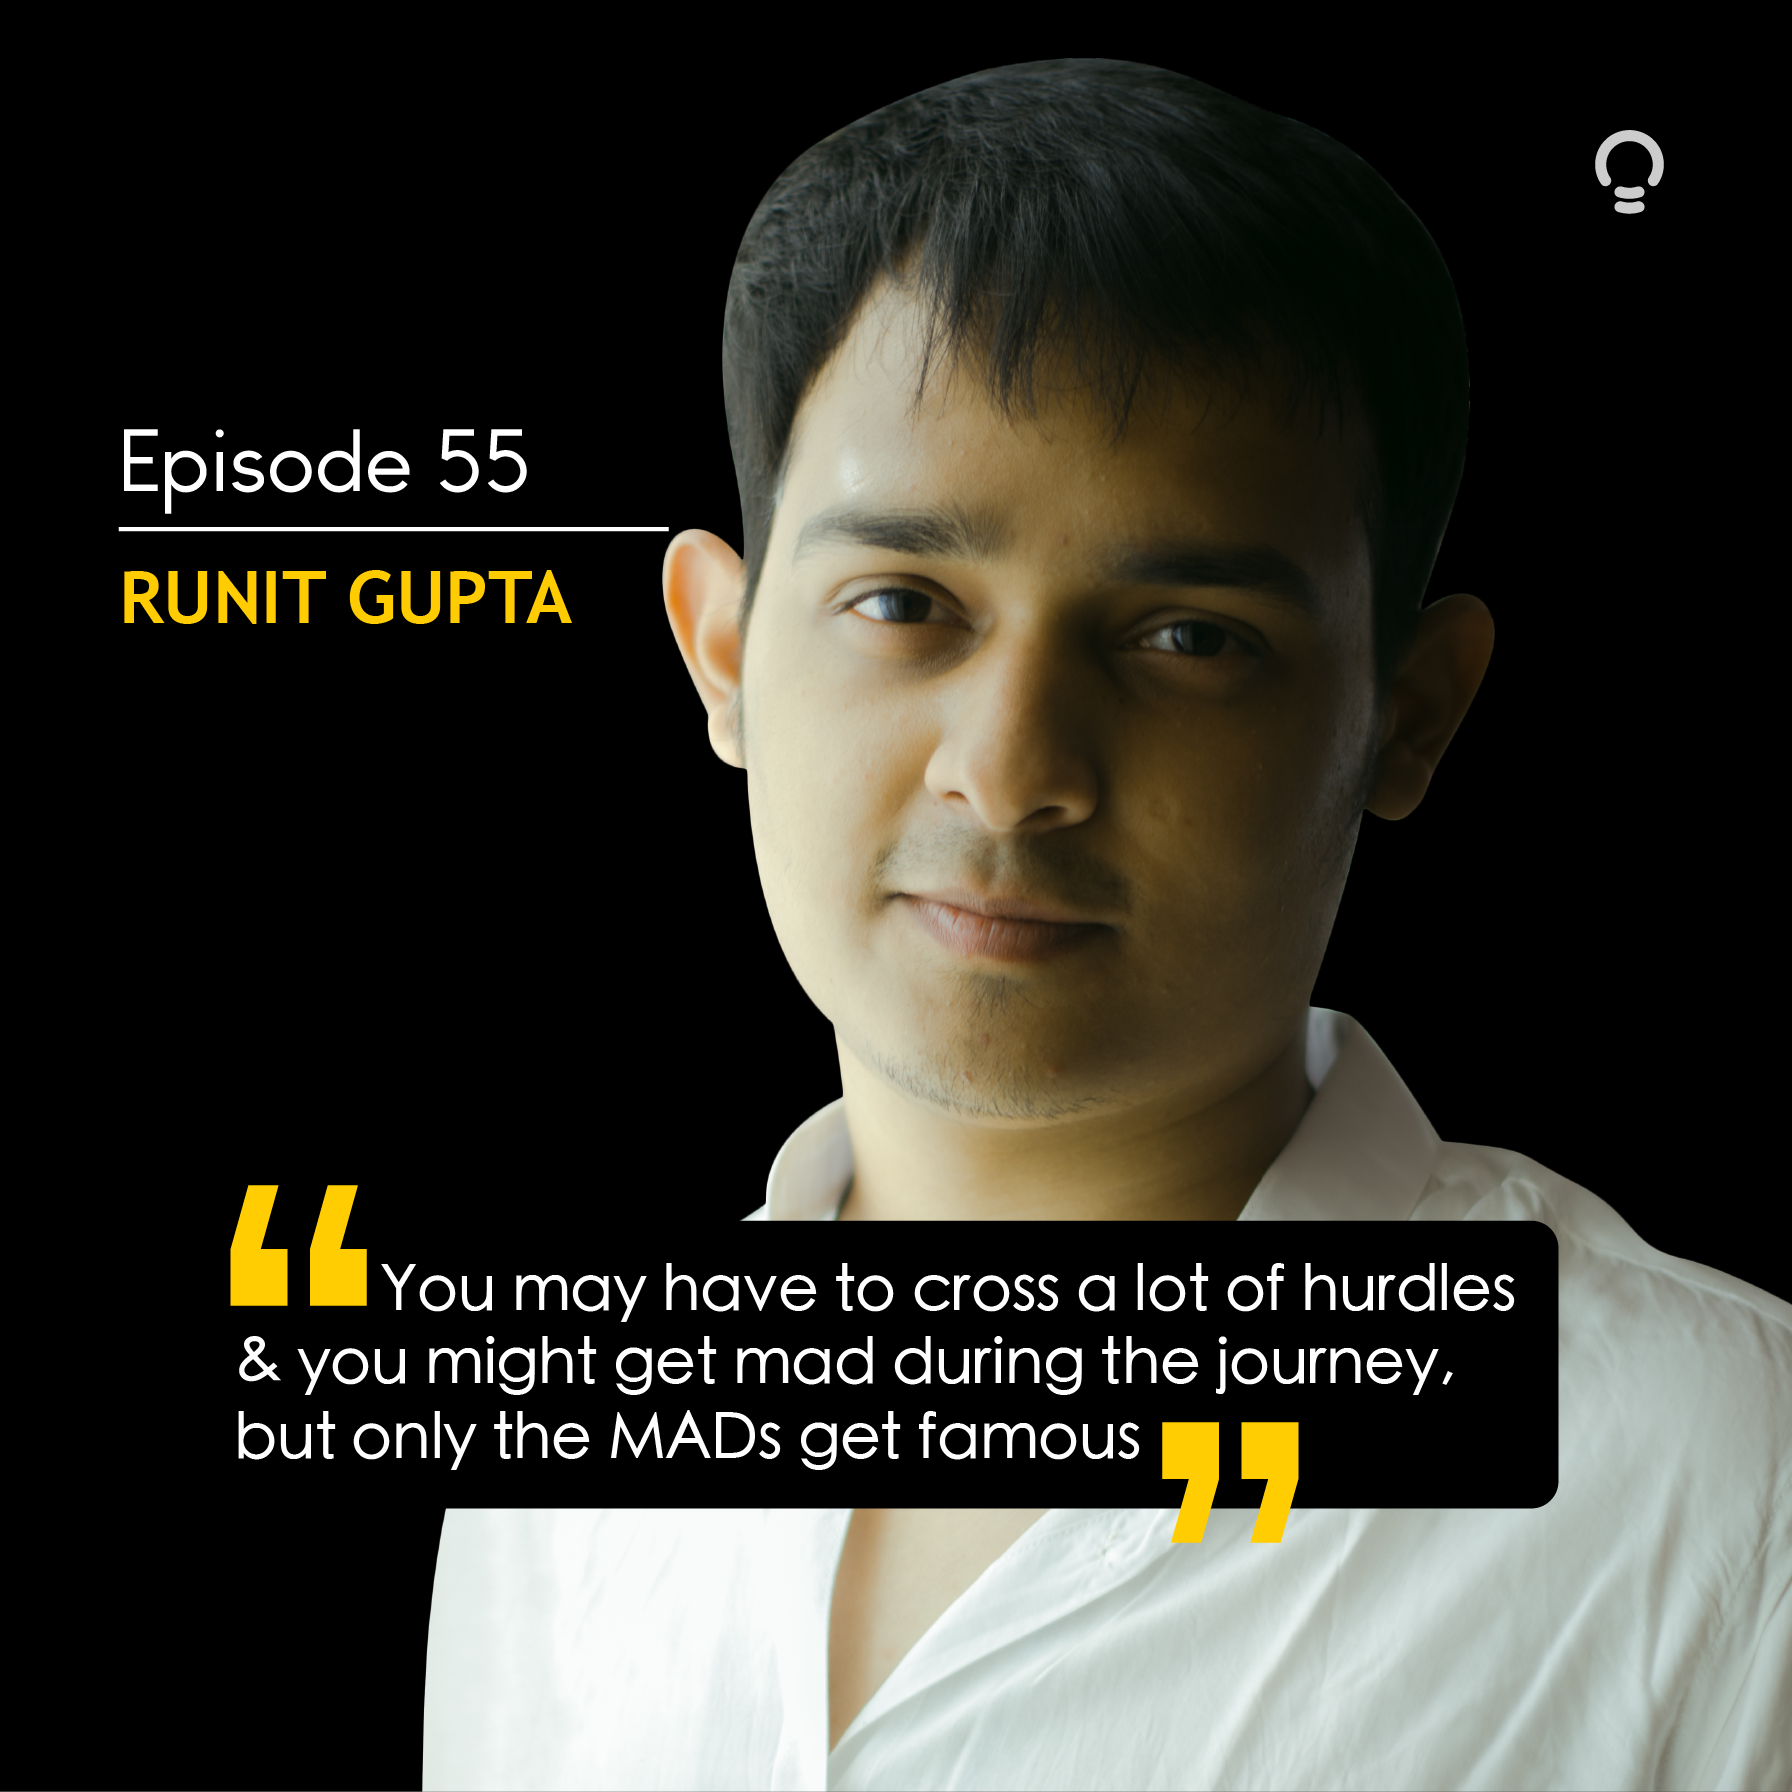 EOI Startup Stories - Runit Gupta